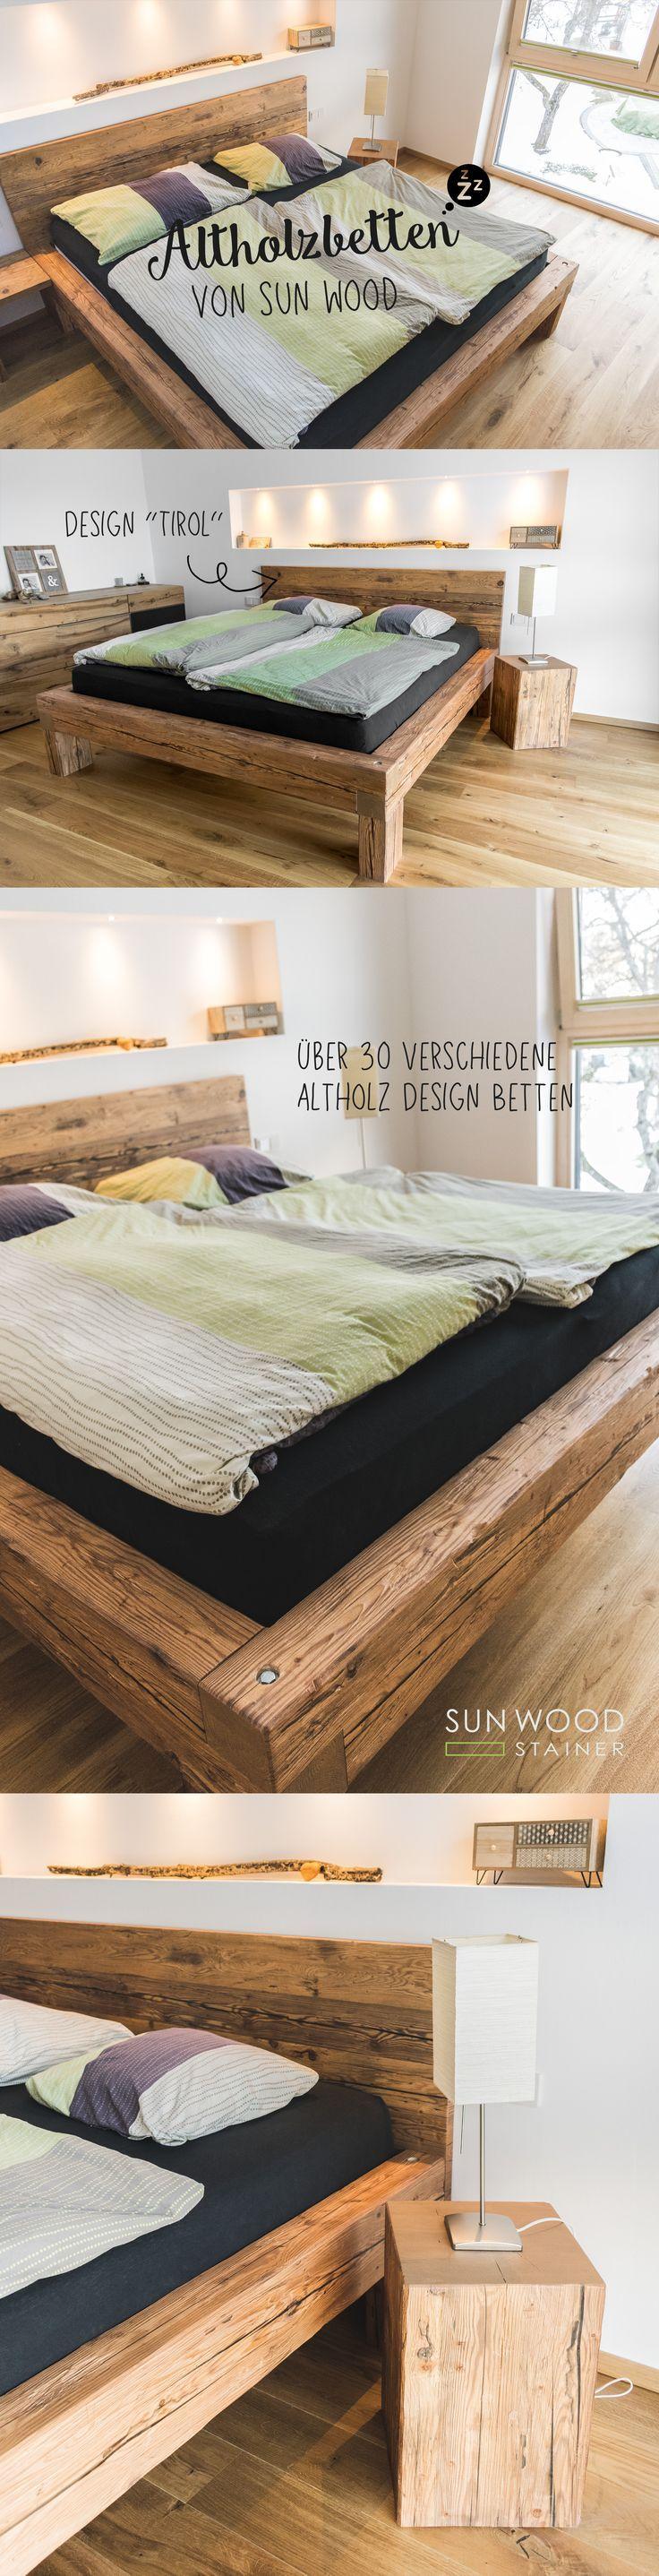 Designerbett aus Altholzbalken,  #interiordesignbedroom #interiordesignbedroomco…